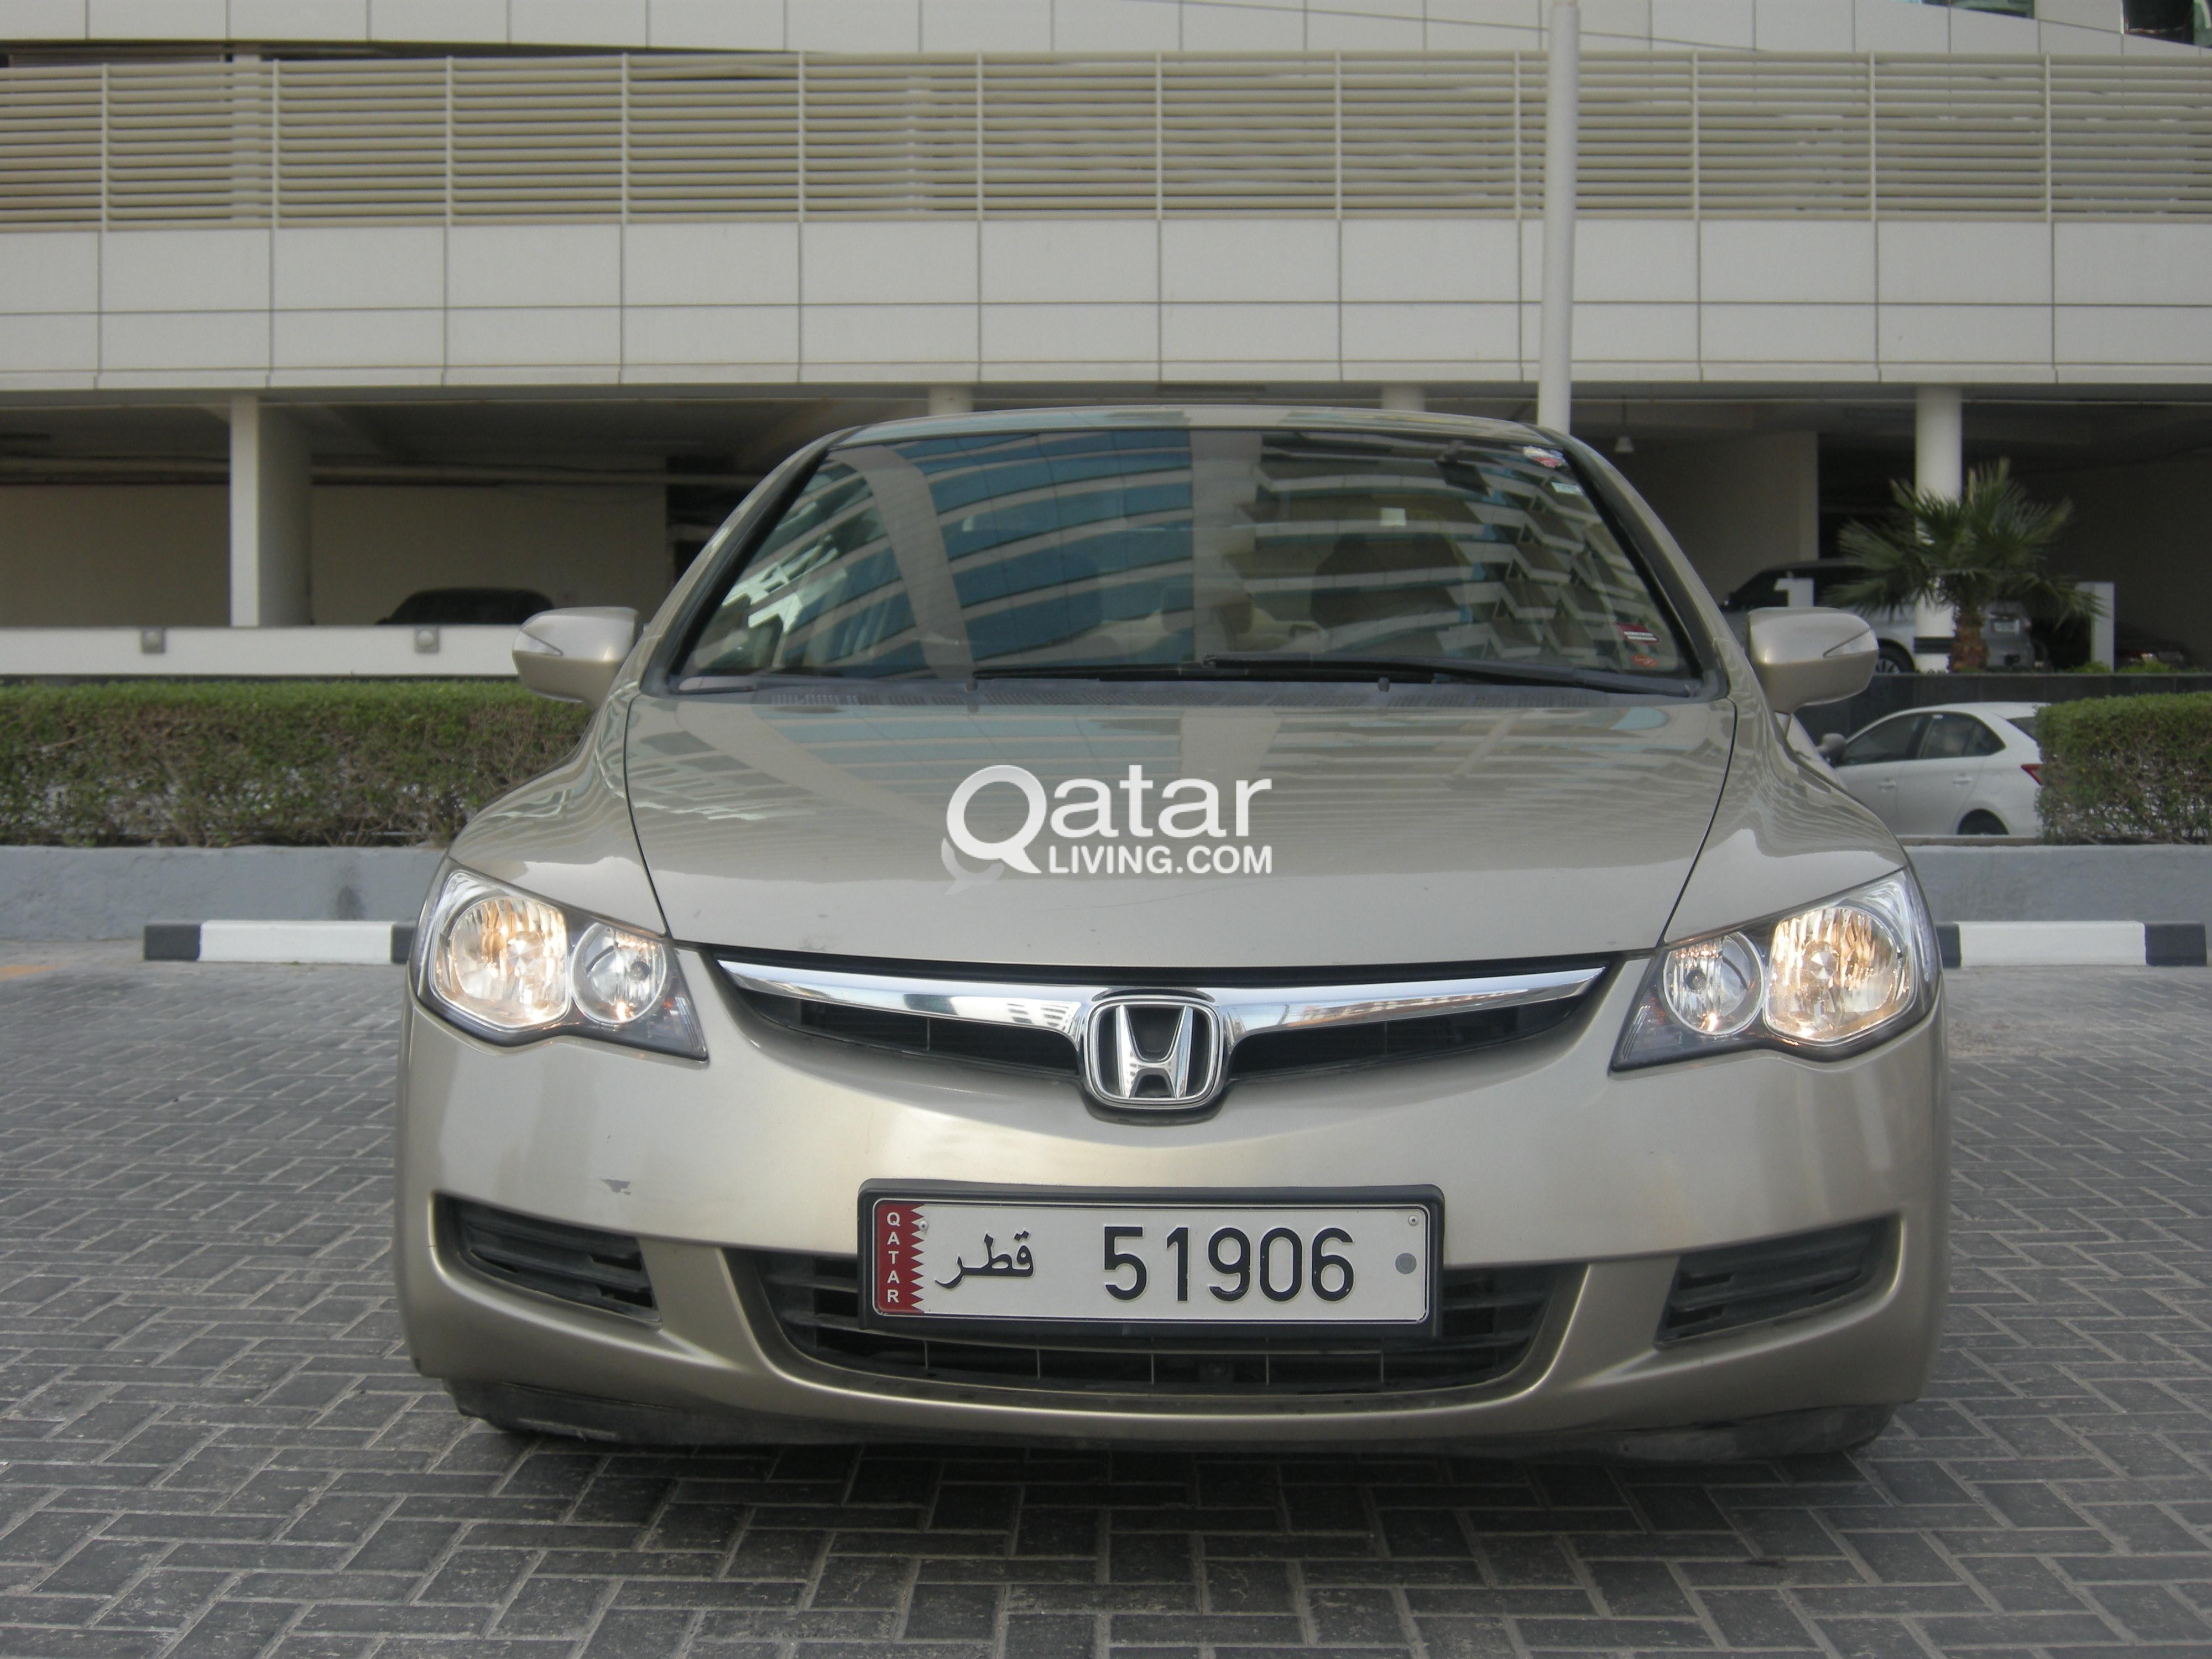 Title; Title; Title; Title; Title; Title; Title. Information. Honda Civic  EXI 2007 ...